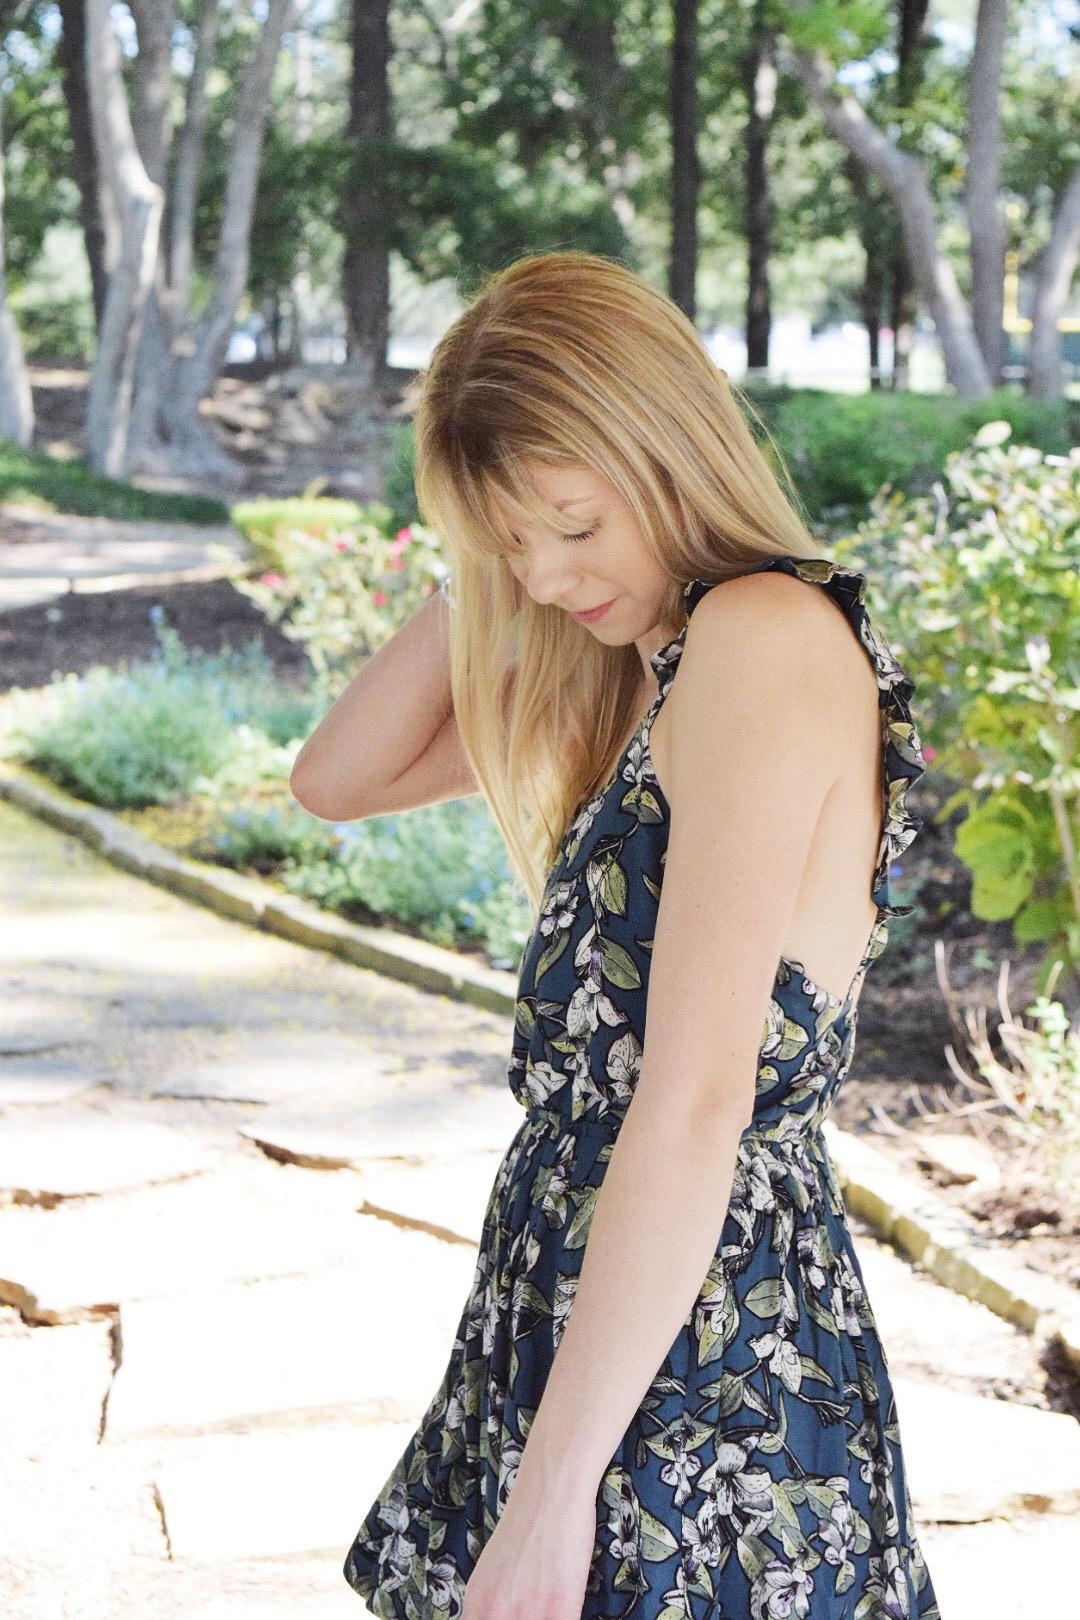 Houston Fashion Blogger - Wander Dust - How to (1).JPG